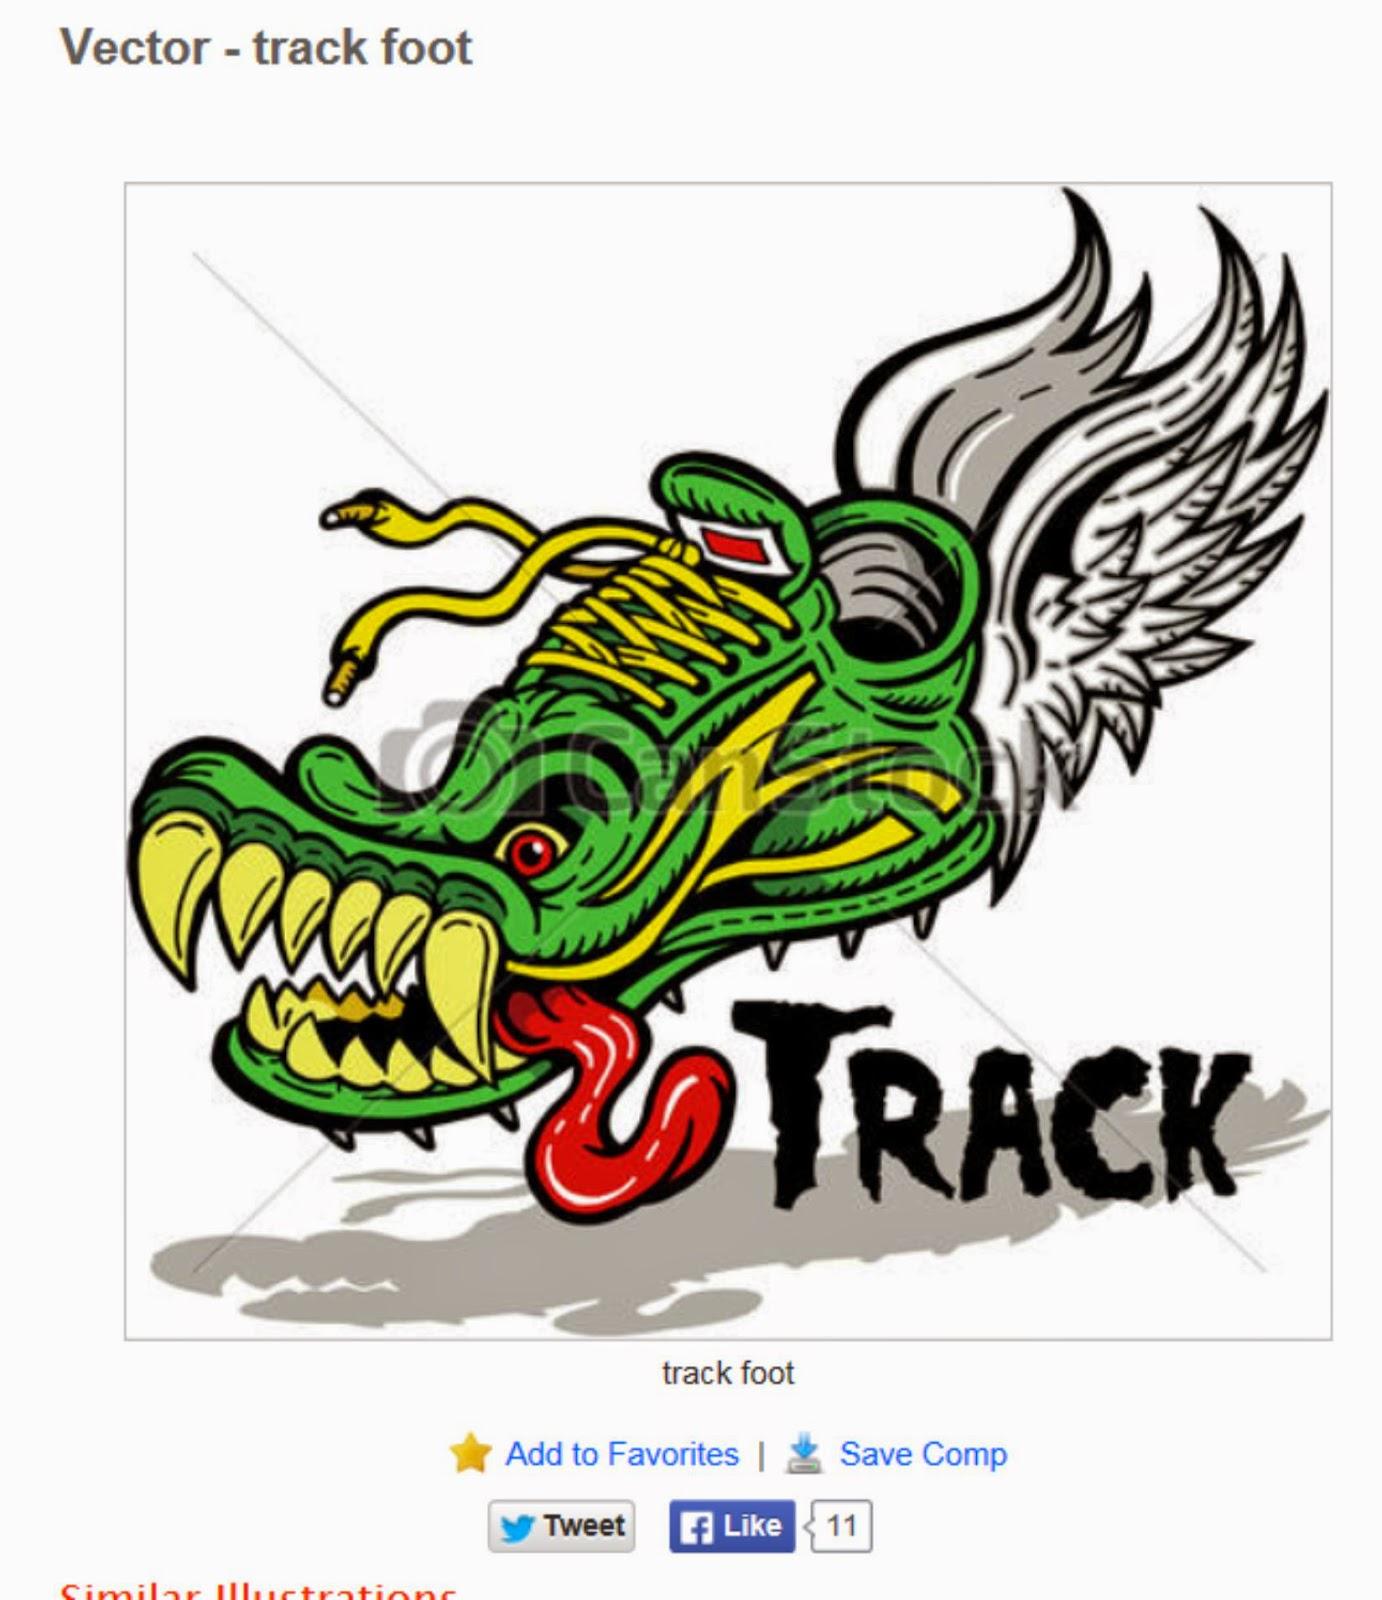 1382x1600 Earlfergusonstudio Track Foot Clip Art